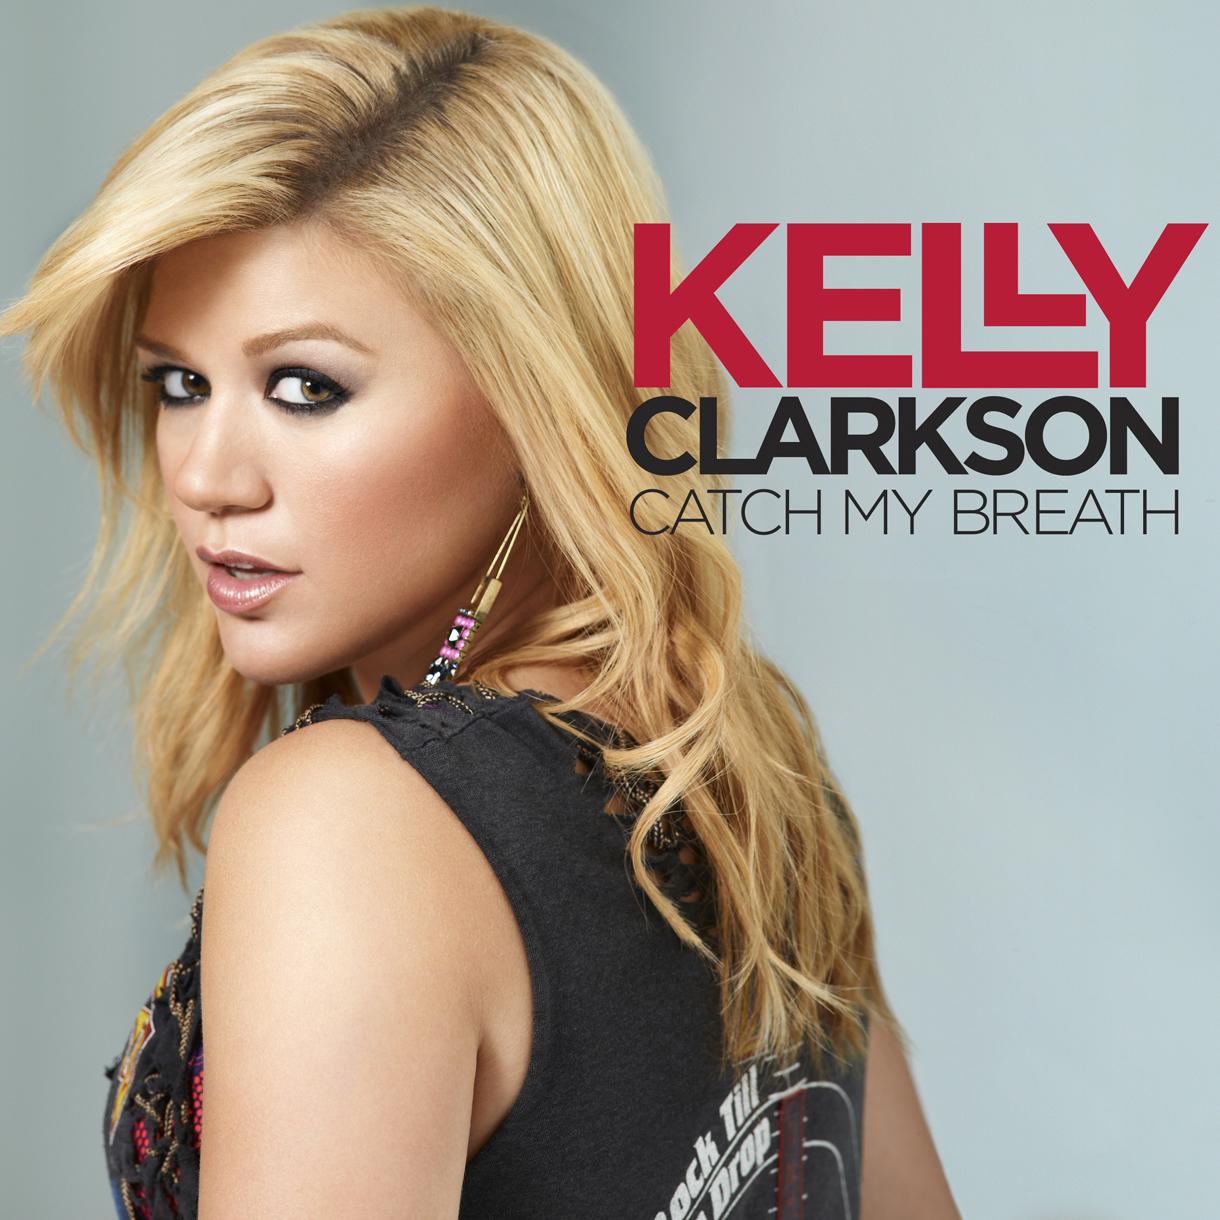 http://1.bp.blogspot.com/-3YtVGX60XaI/UIcmuZr81NI/AAAAAAAAHLg/eAiHBnxBTWk/s1600/Kelly+Clarkson+-+Catching+My+Breath+(Brian+Cua+Bootleg+Remix).jpg